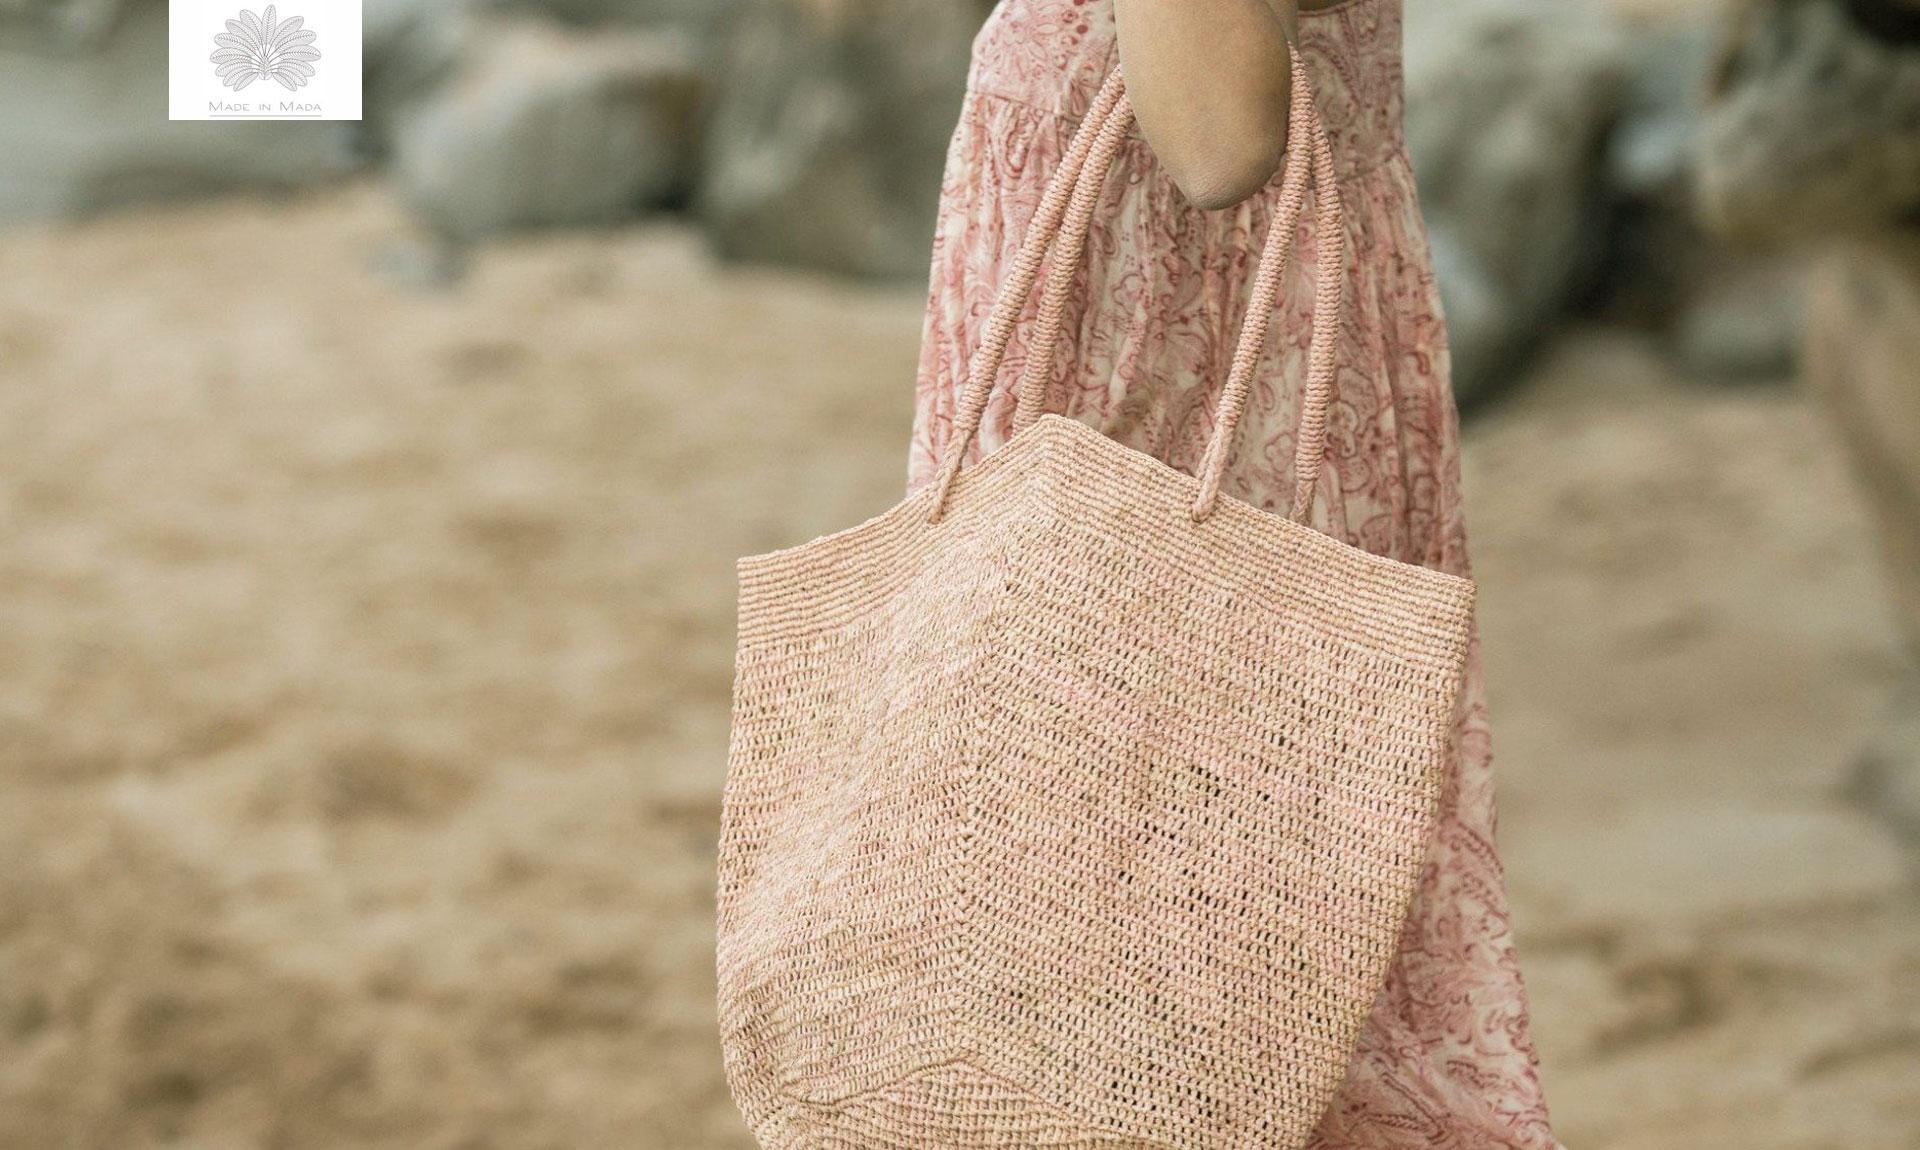 Nouvelle-marque-Made-in-Mada-avec-accessoires-en-raphia-naturel